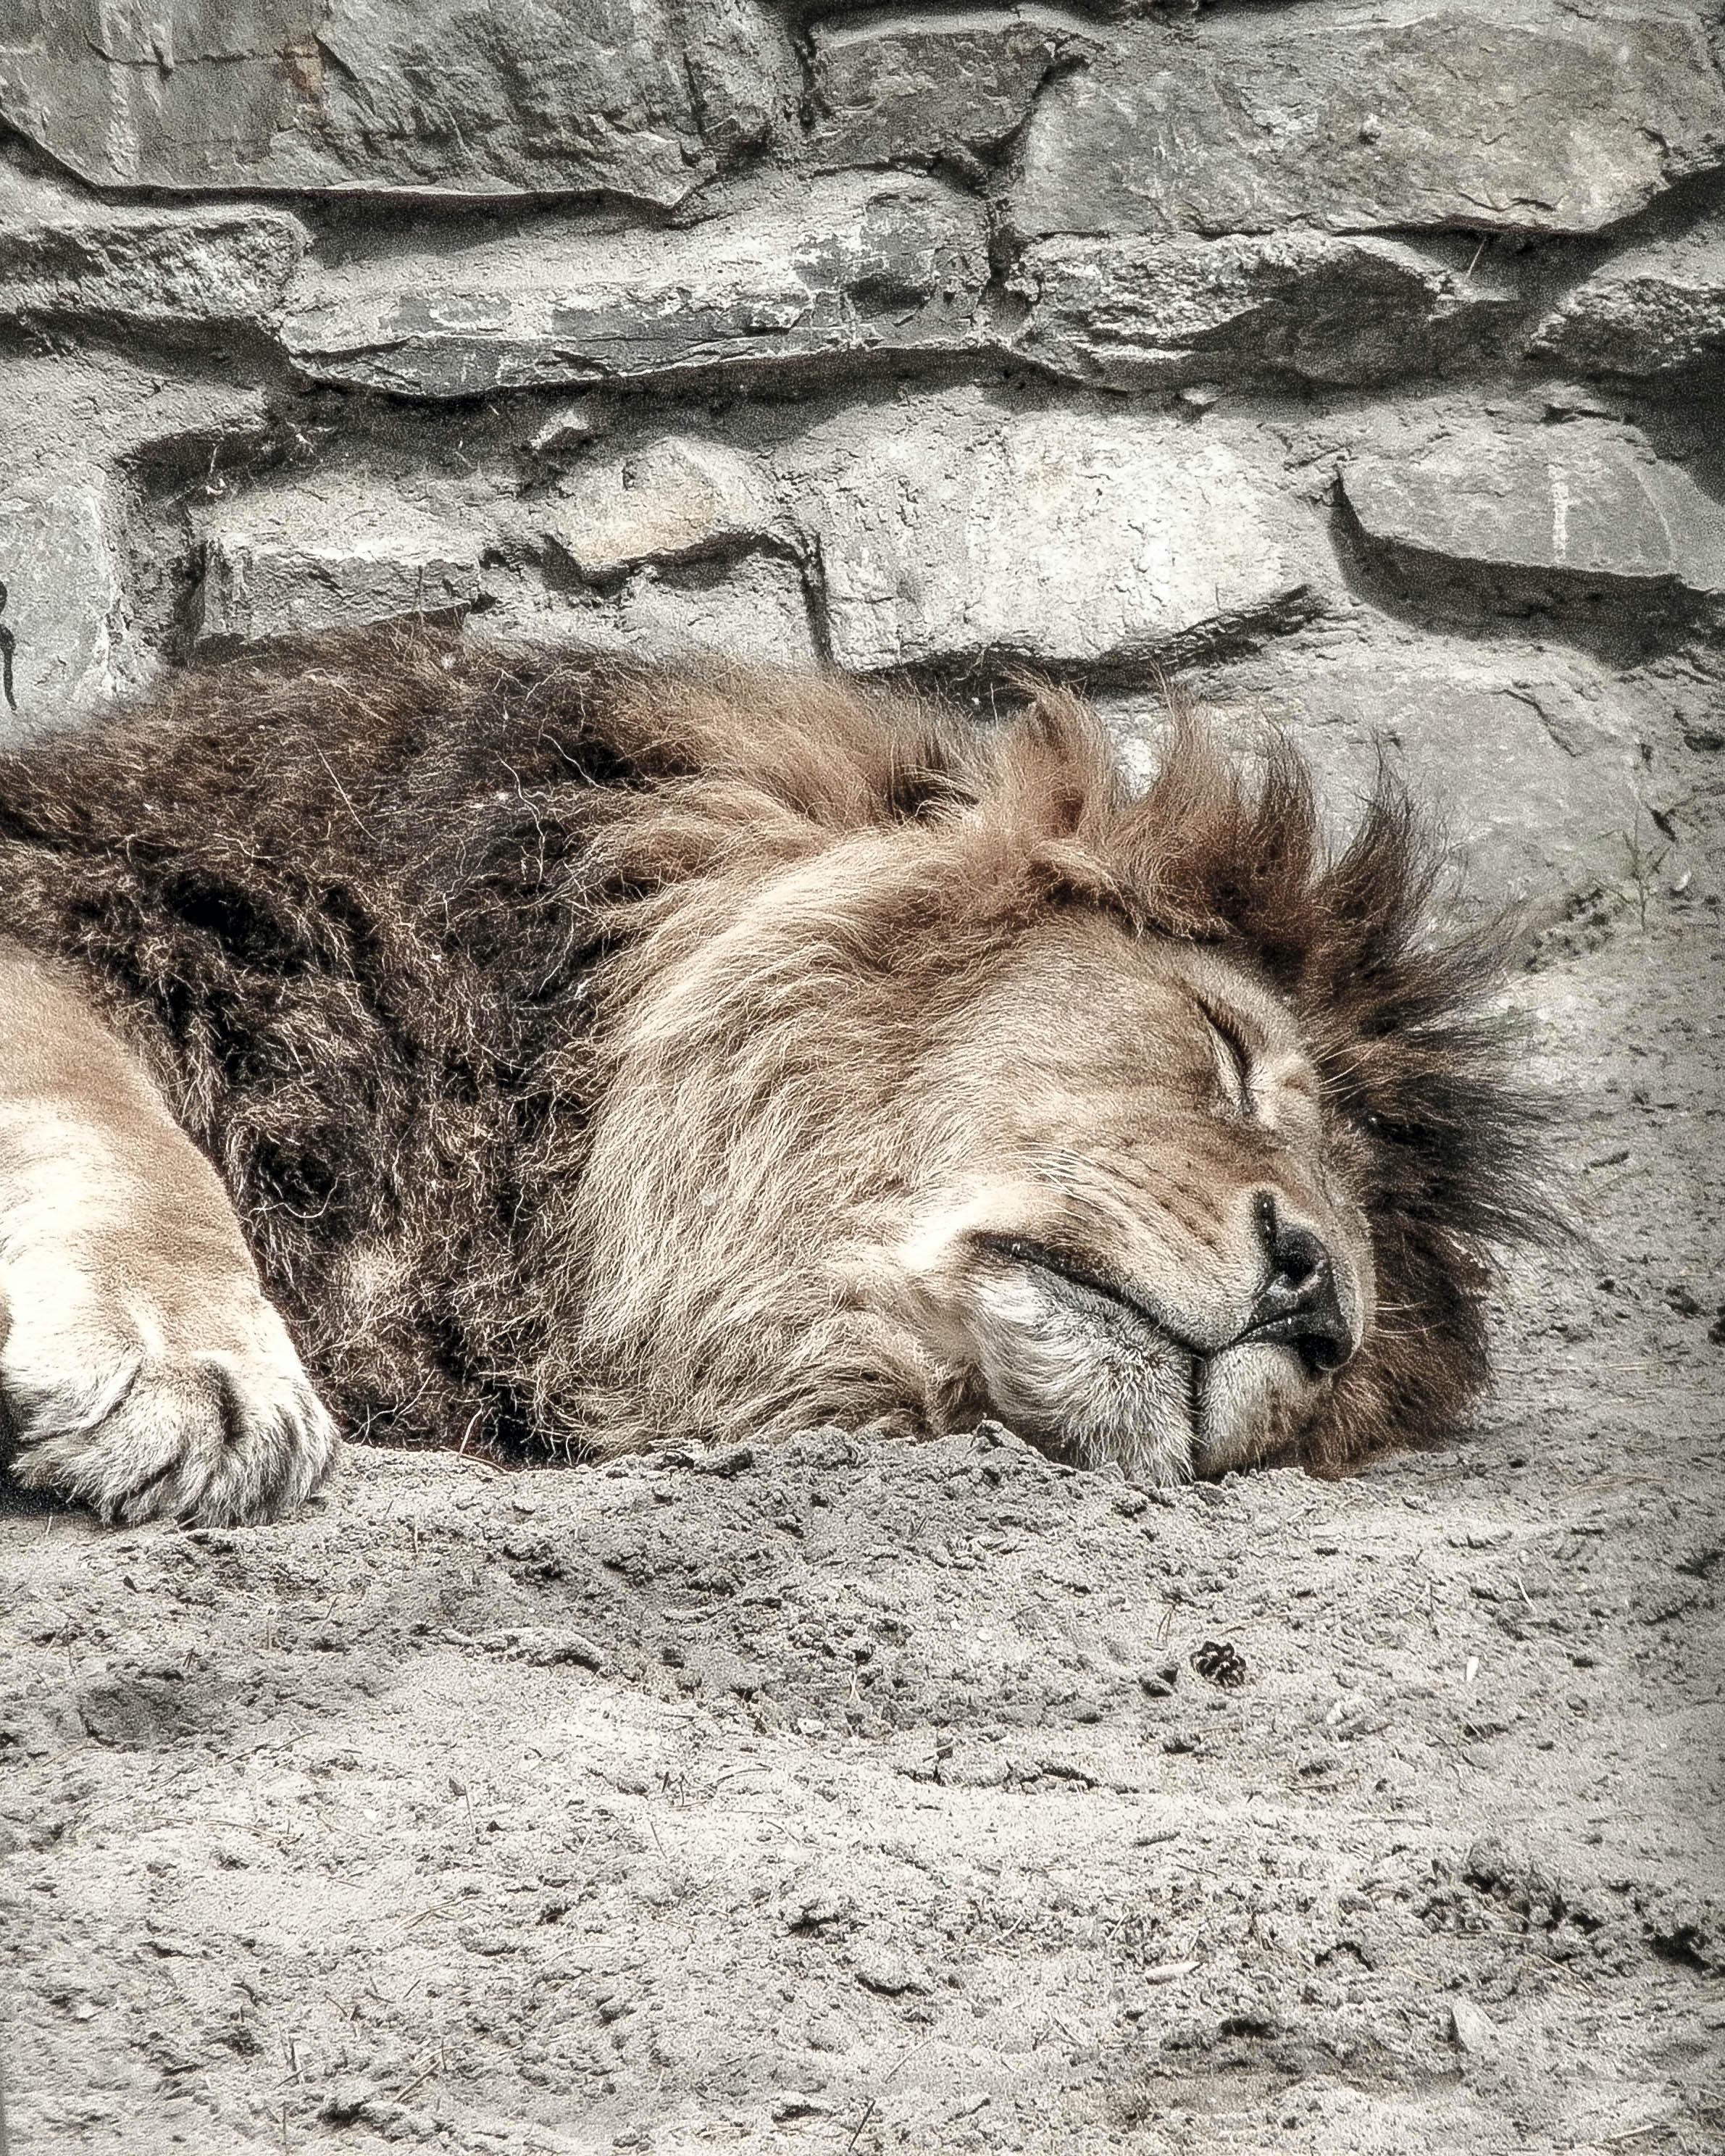 brown lion lying on gray soil during daytime